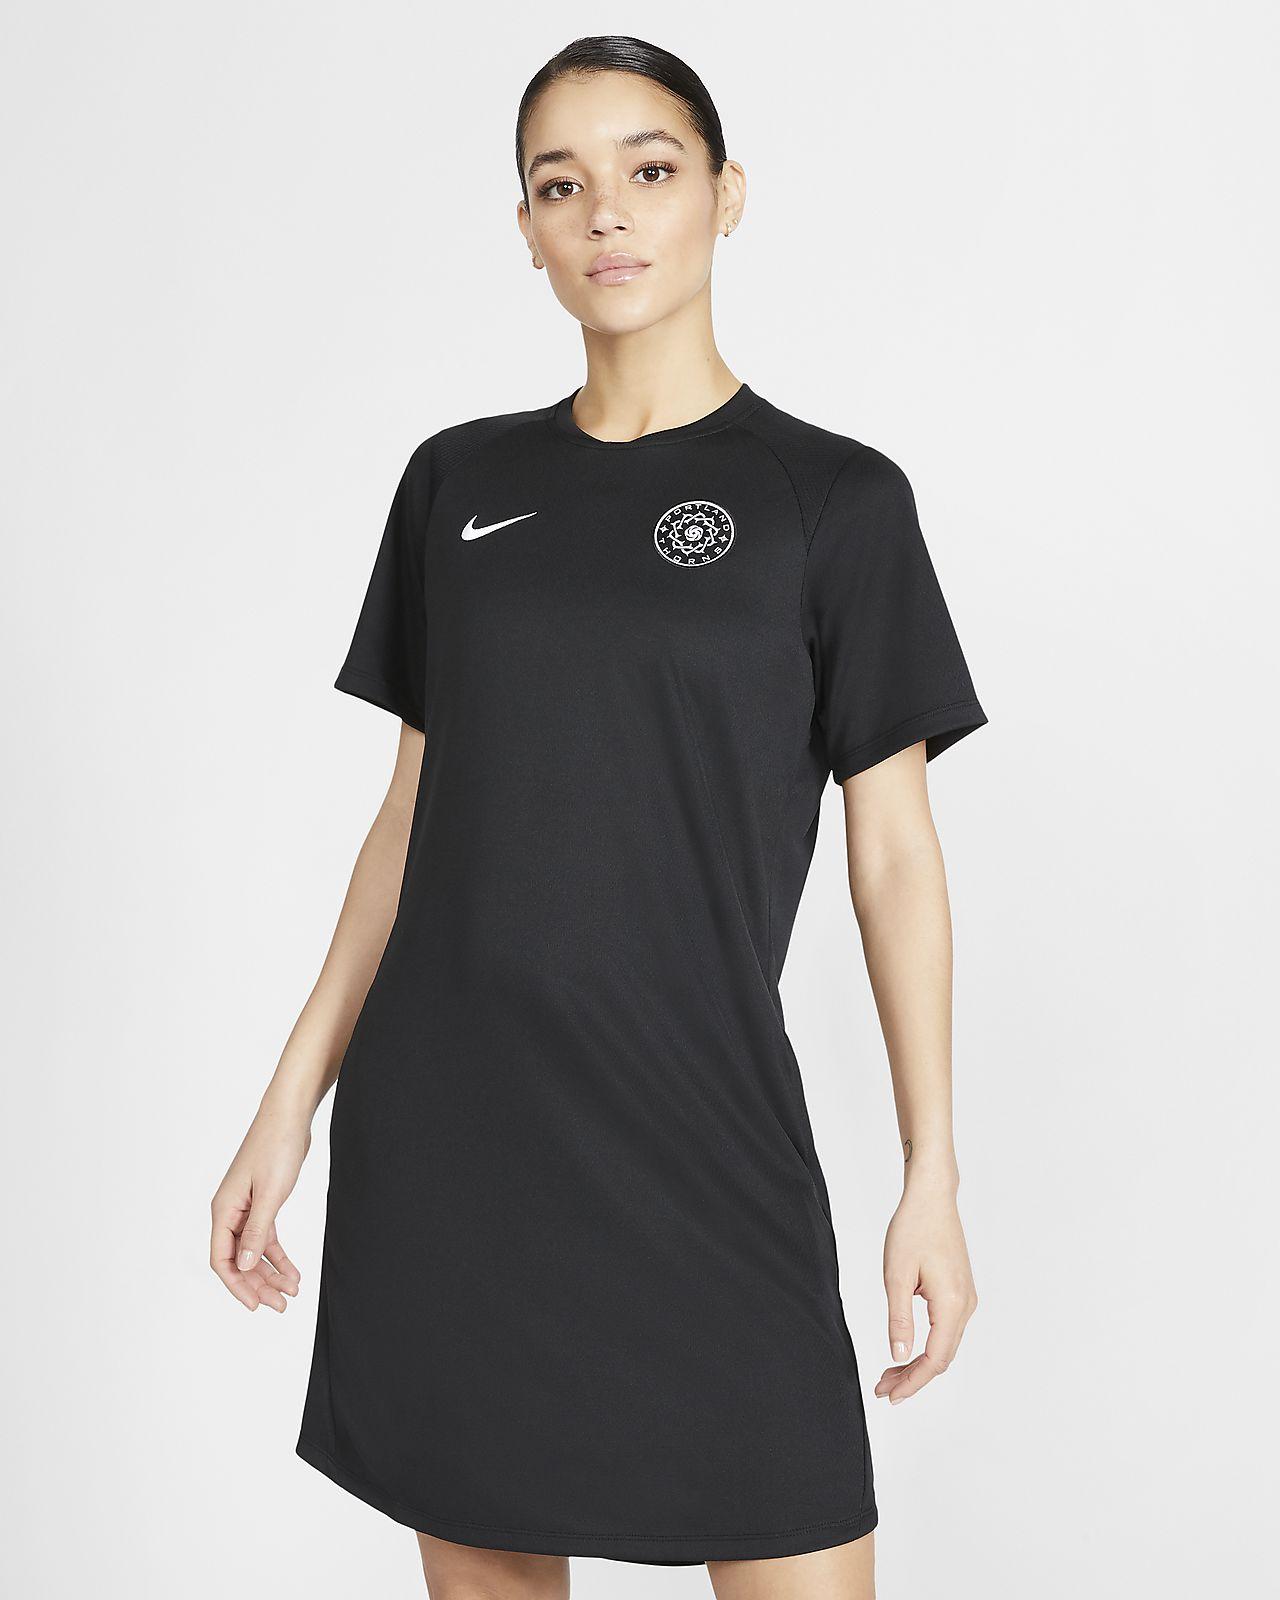 Portland Thorns FC Women's Soccer Dress